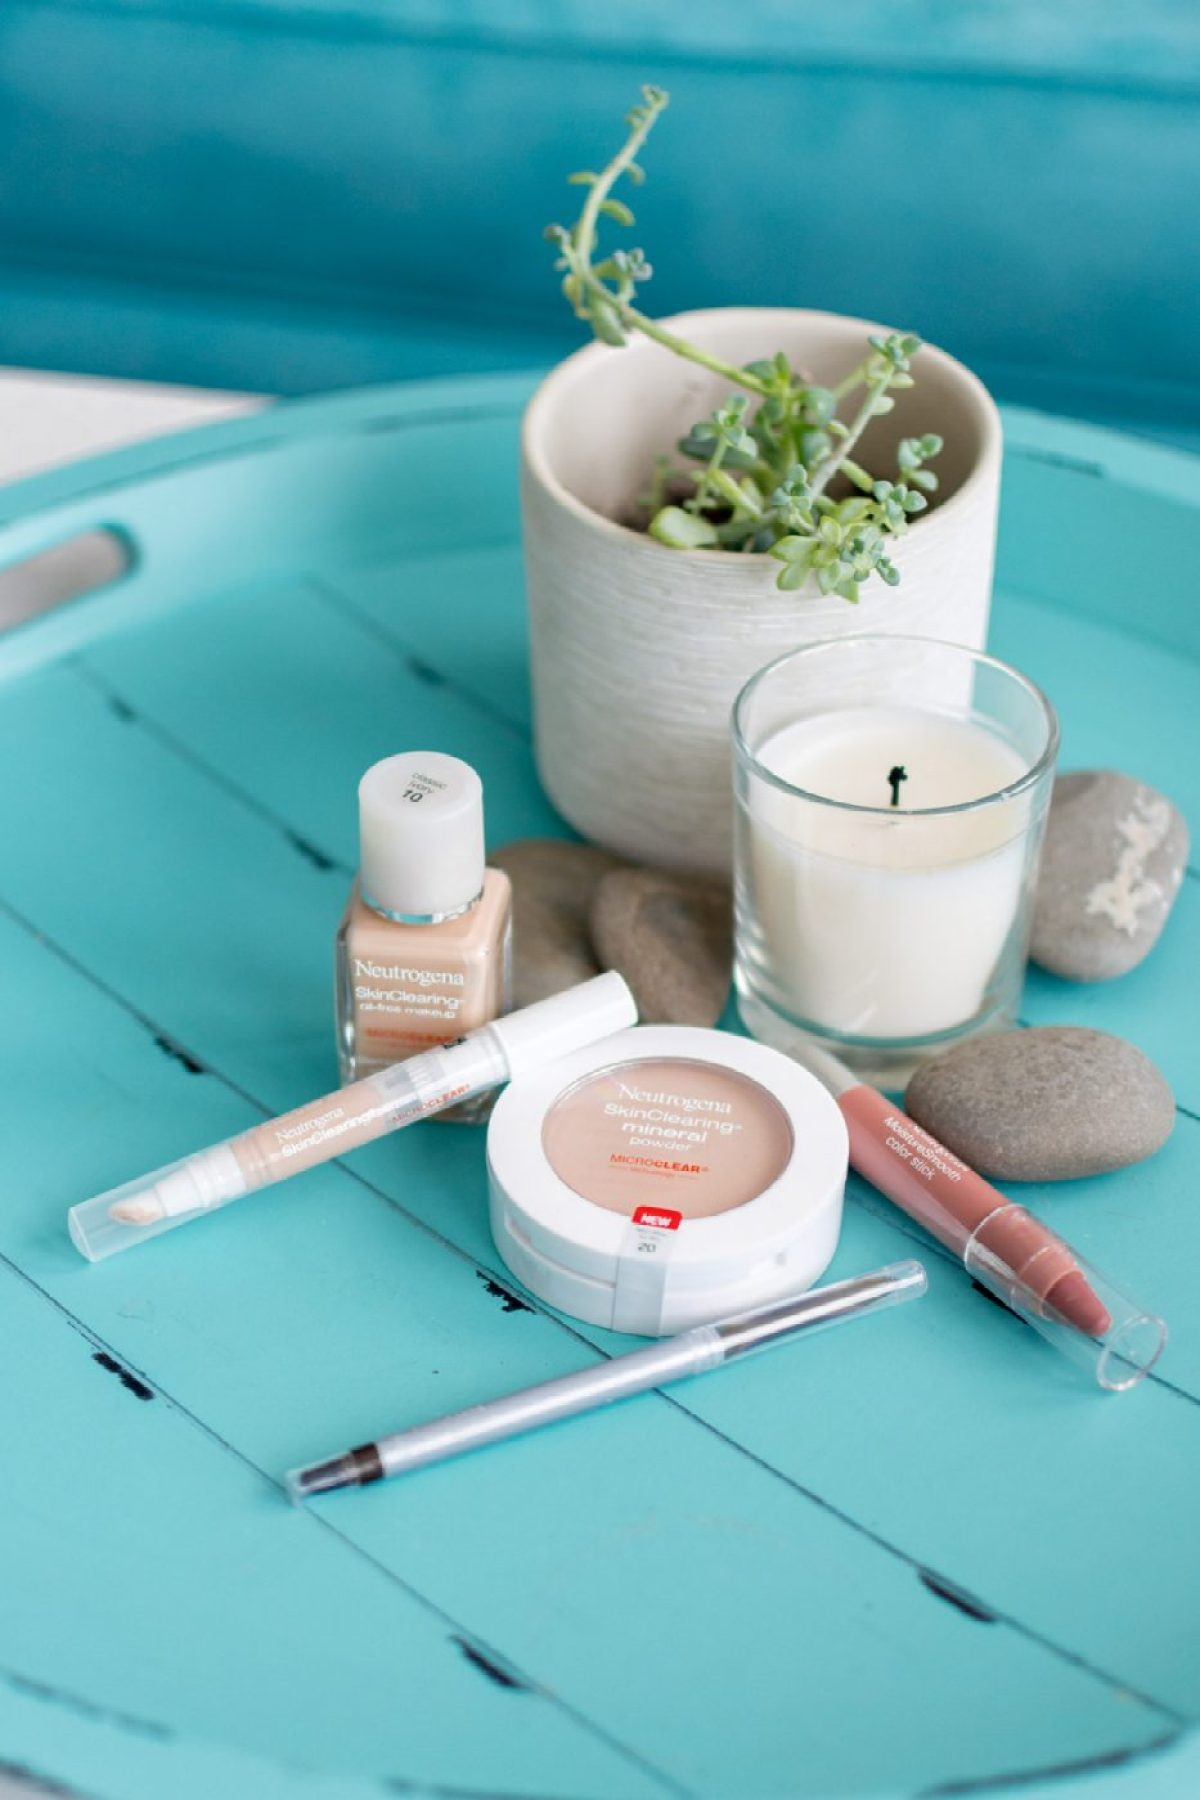 Neutrogena Back To School Makeup Tutorial - Sweet Teal